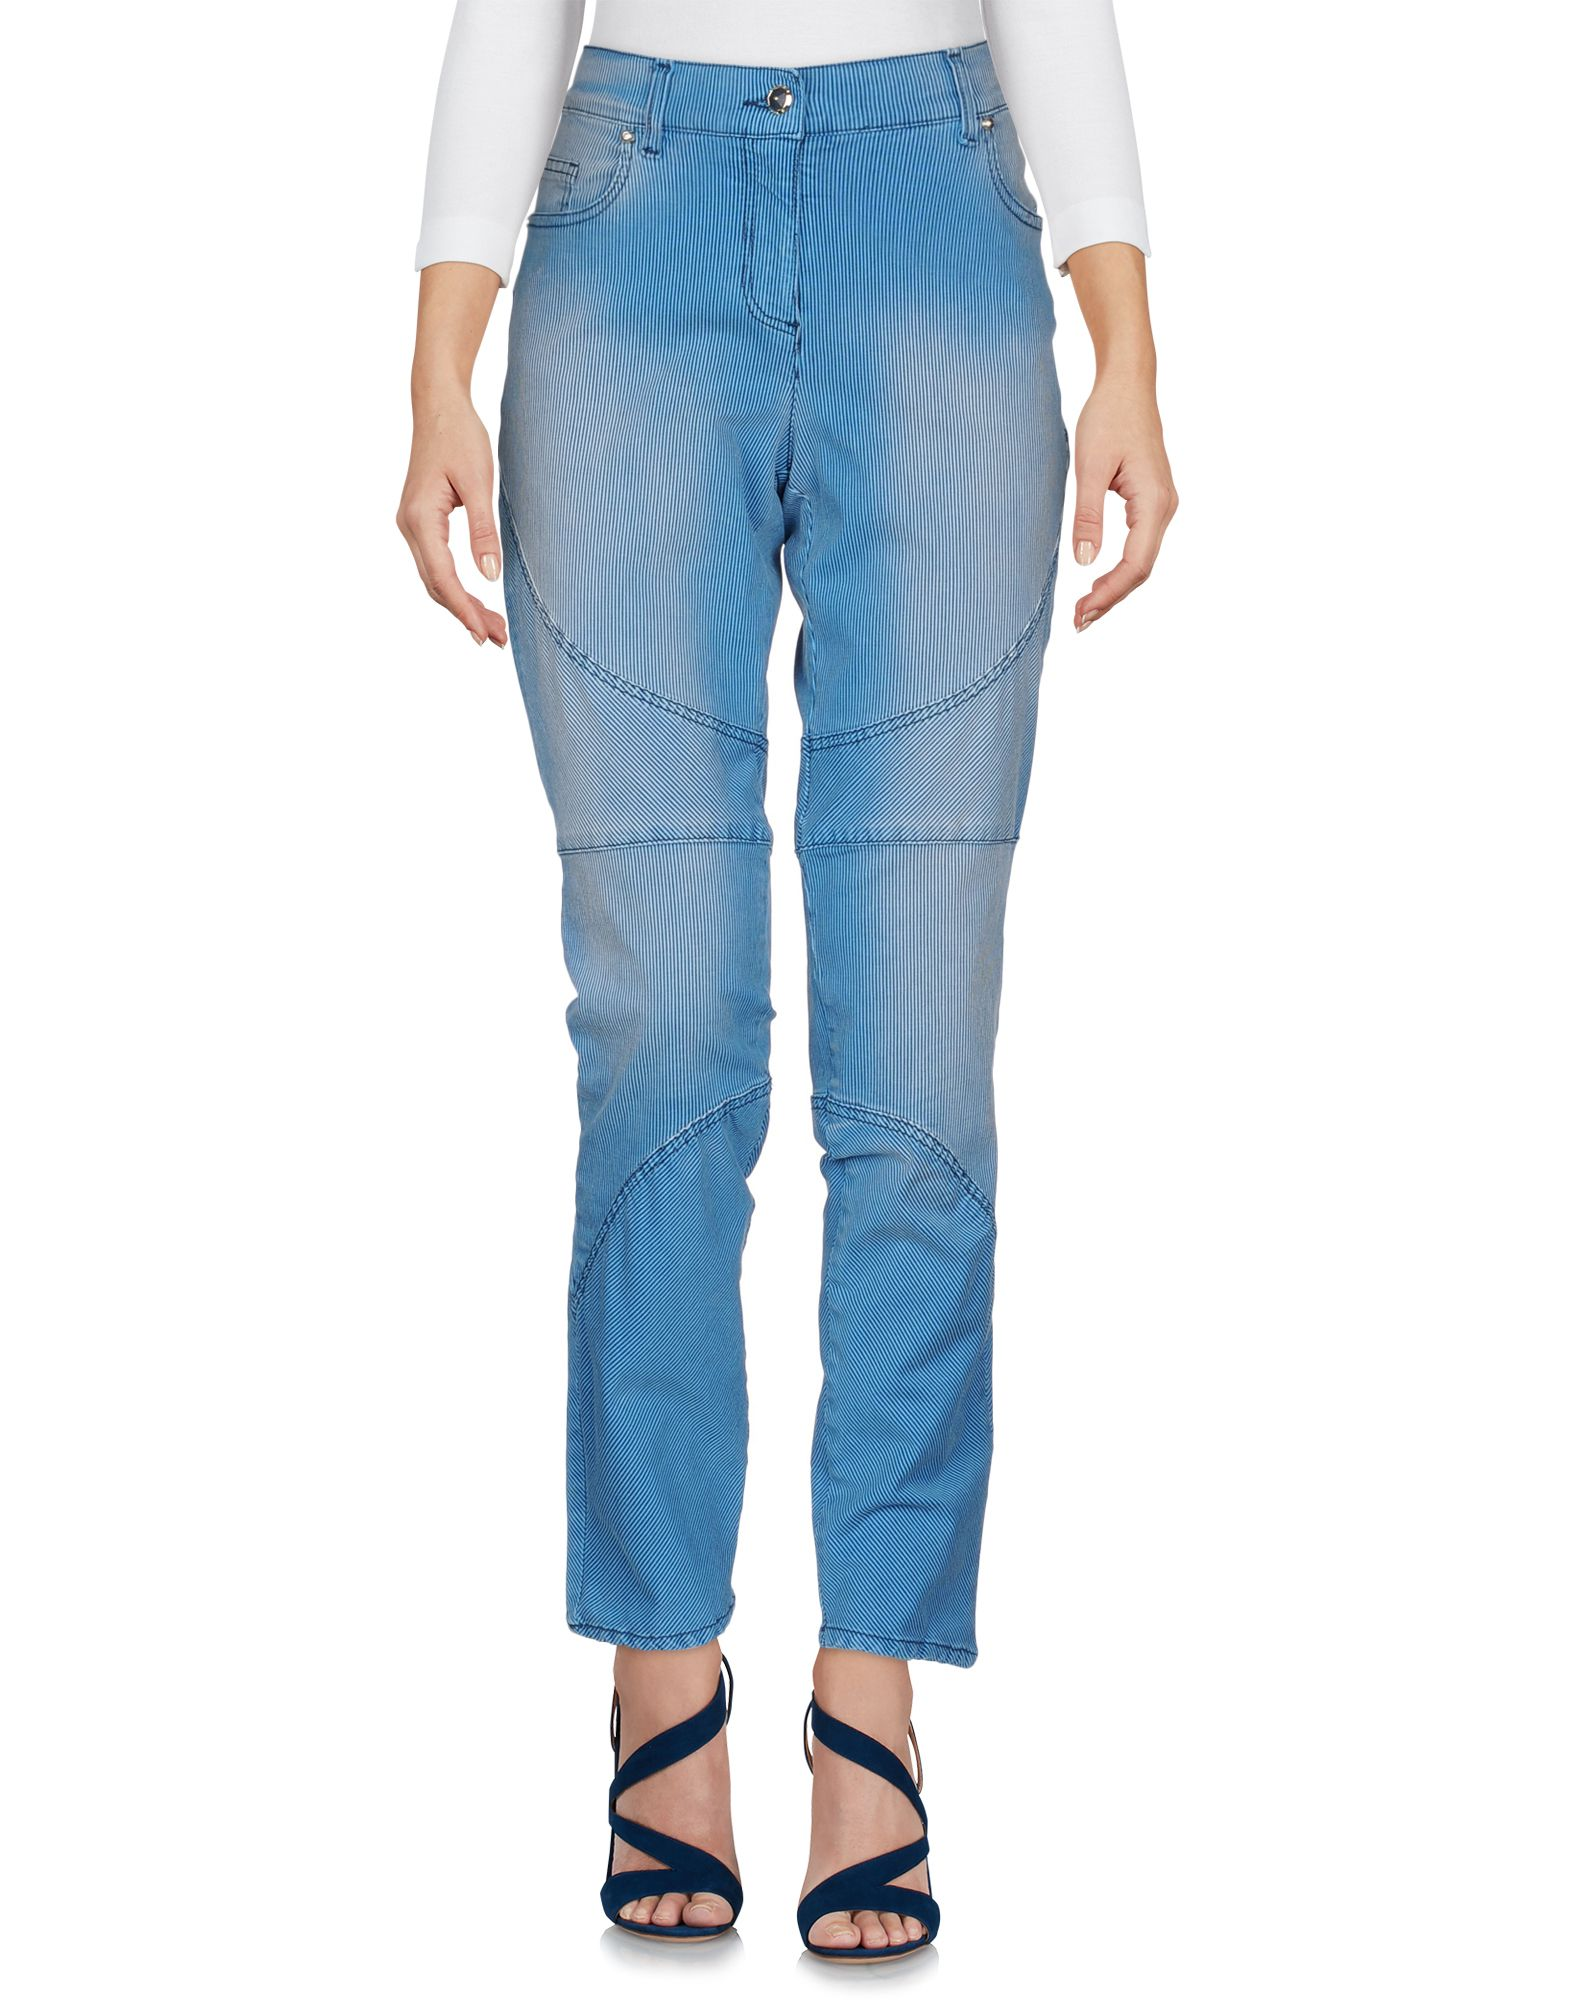 VERSACE JEANS Джинсовые брюки summer boyfriend jeans for women hole ripped white lace flowers denim pants low waist mujer vintage skinny stretch jeans female